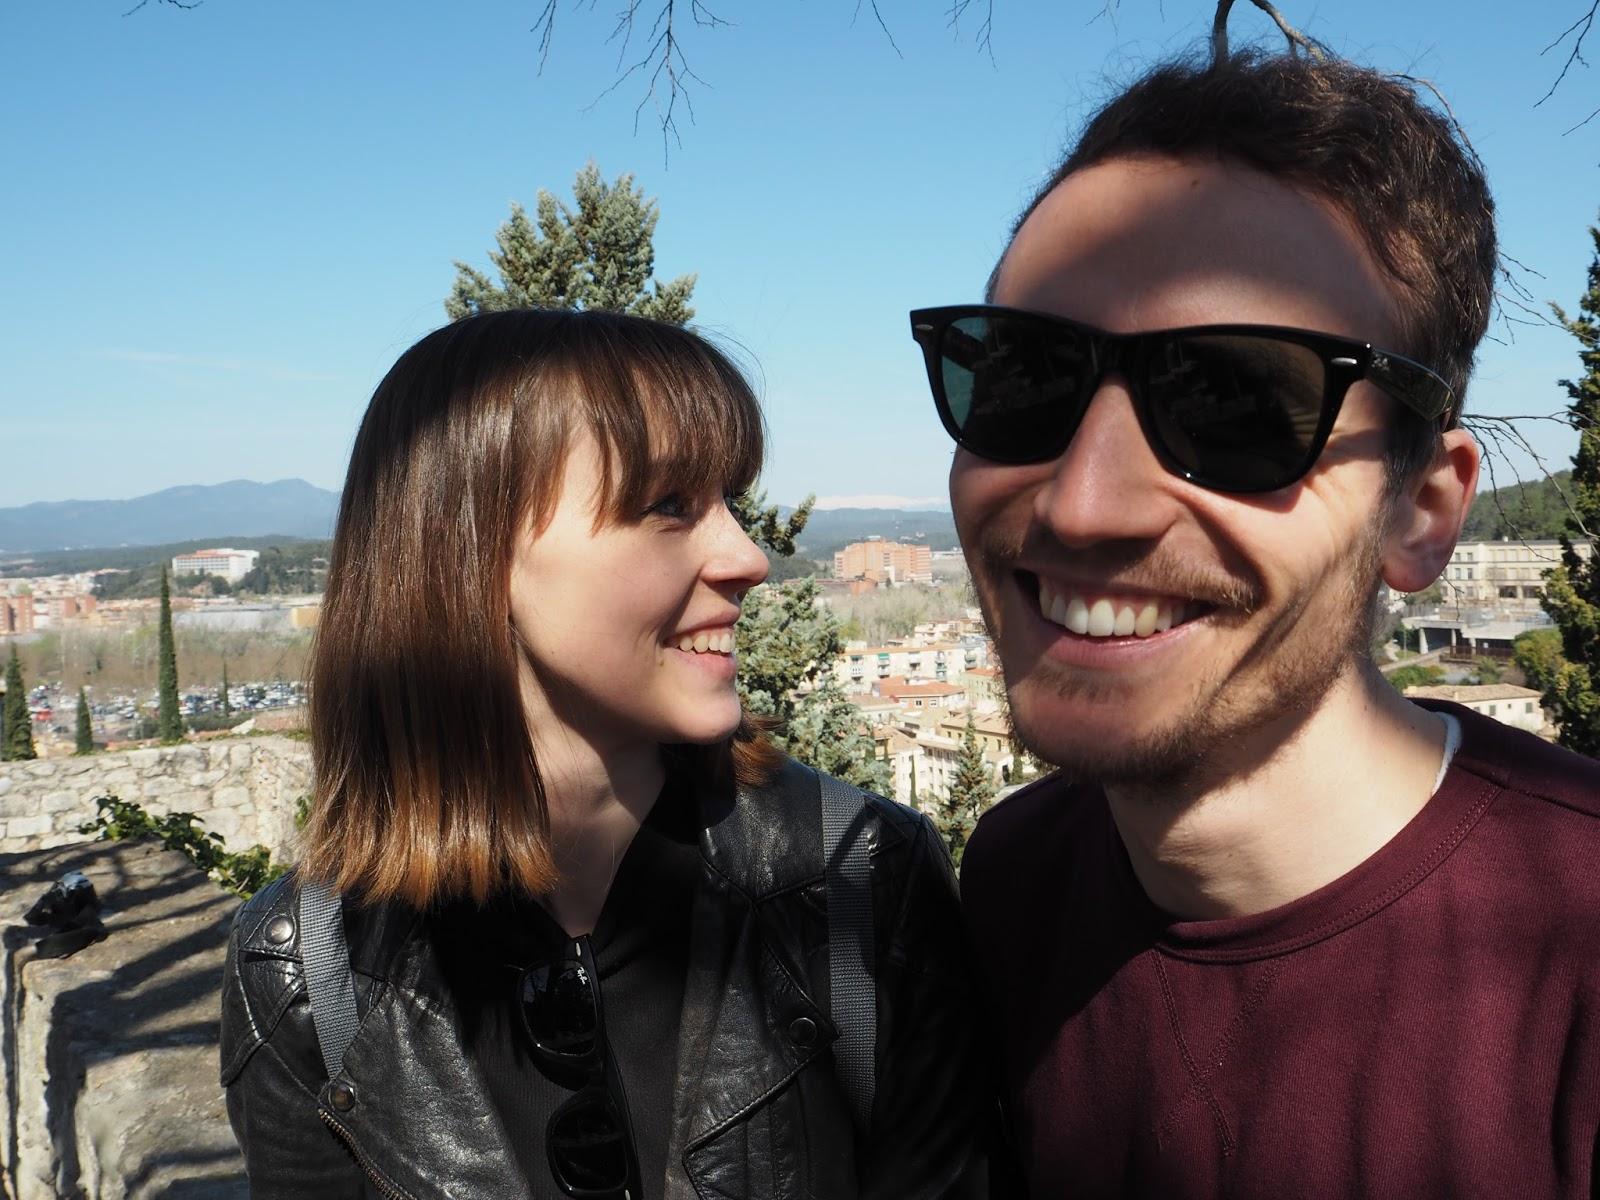 Girona Spain photo diary